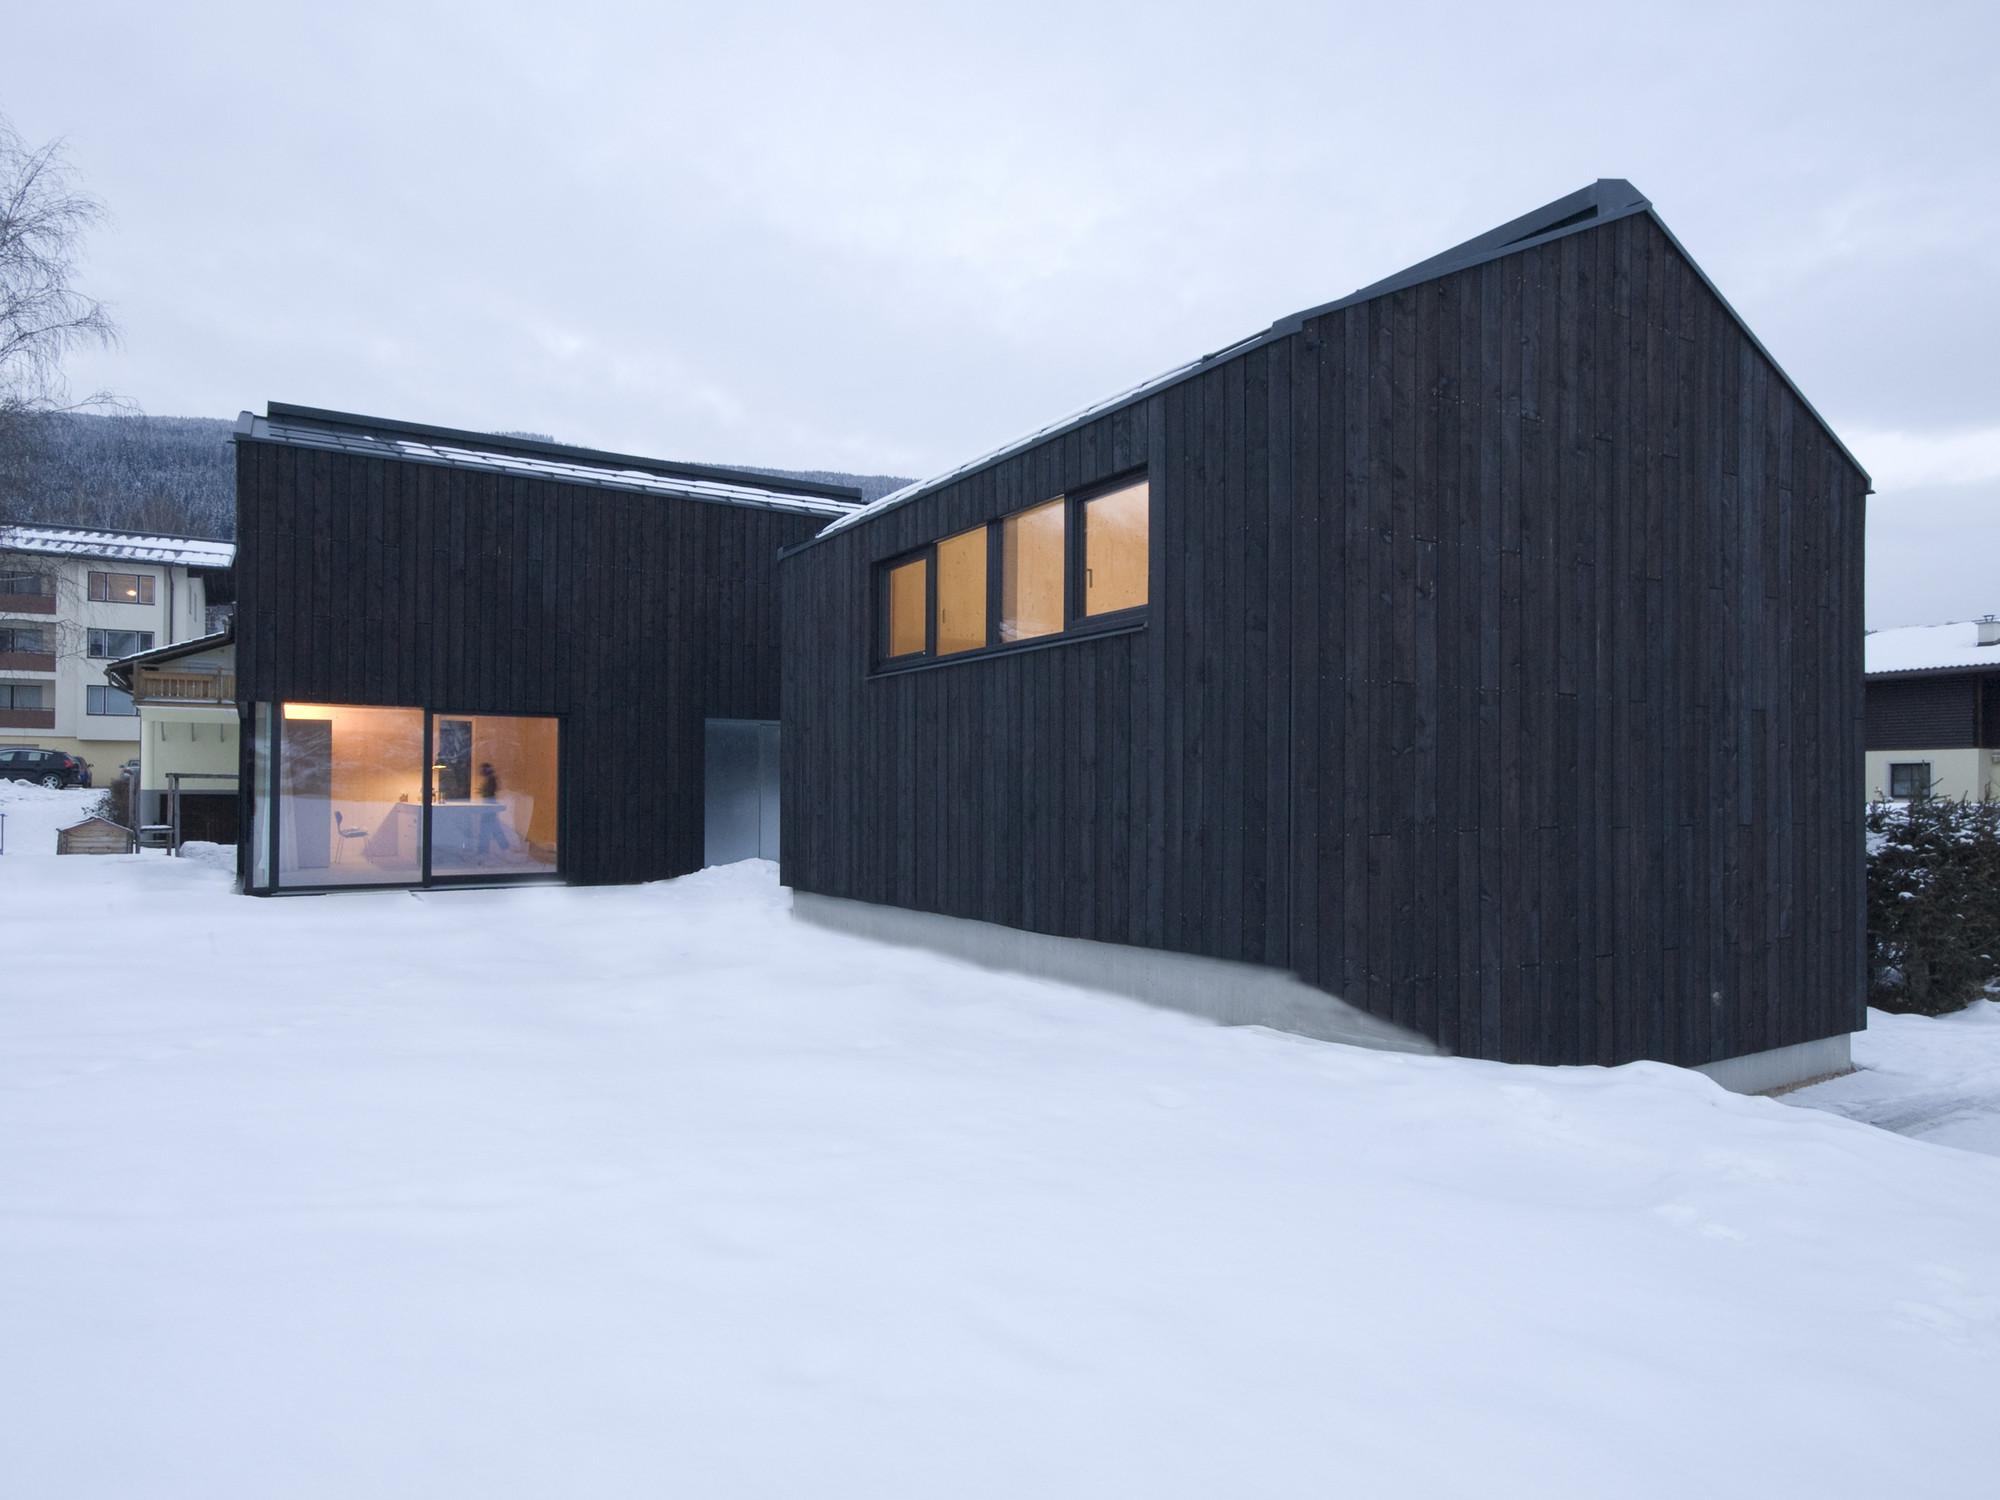 Trattner Scharfetter Residence / LP Architektur, © wortmeyer photography